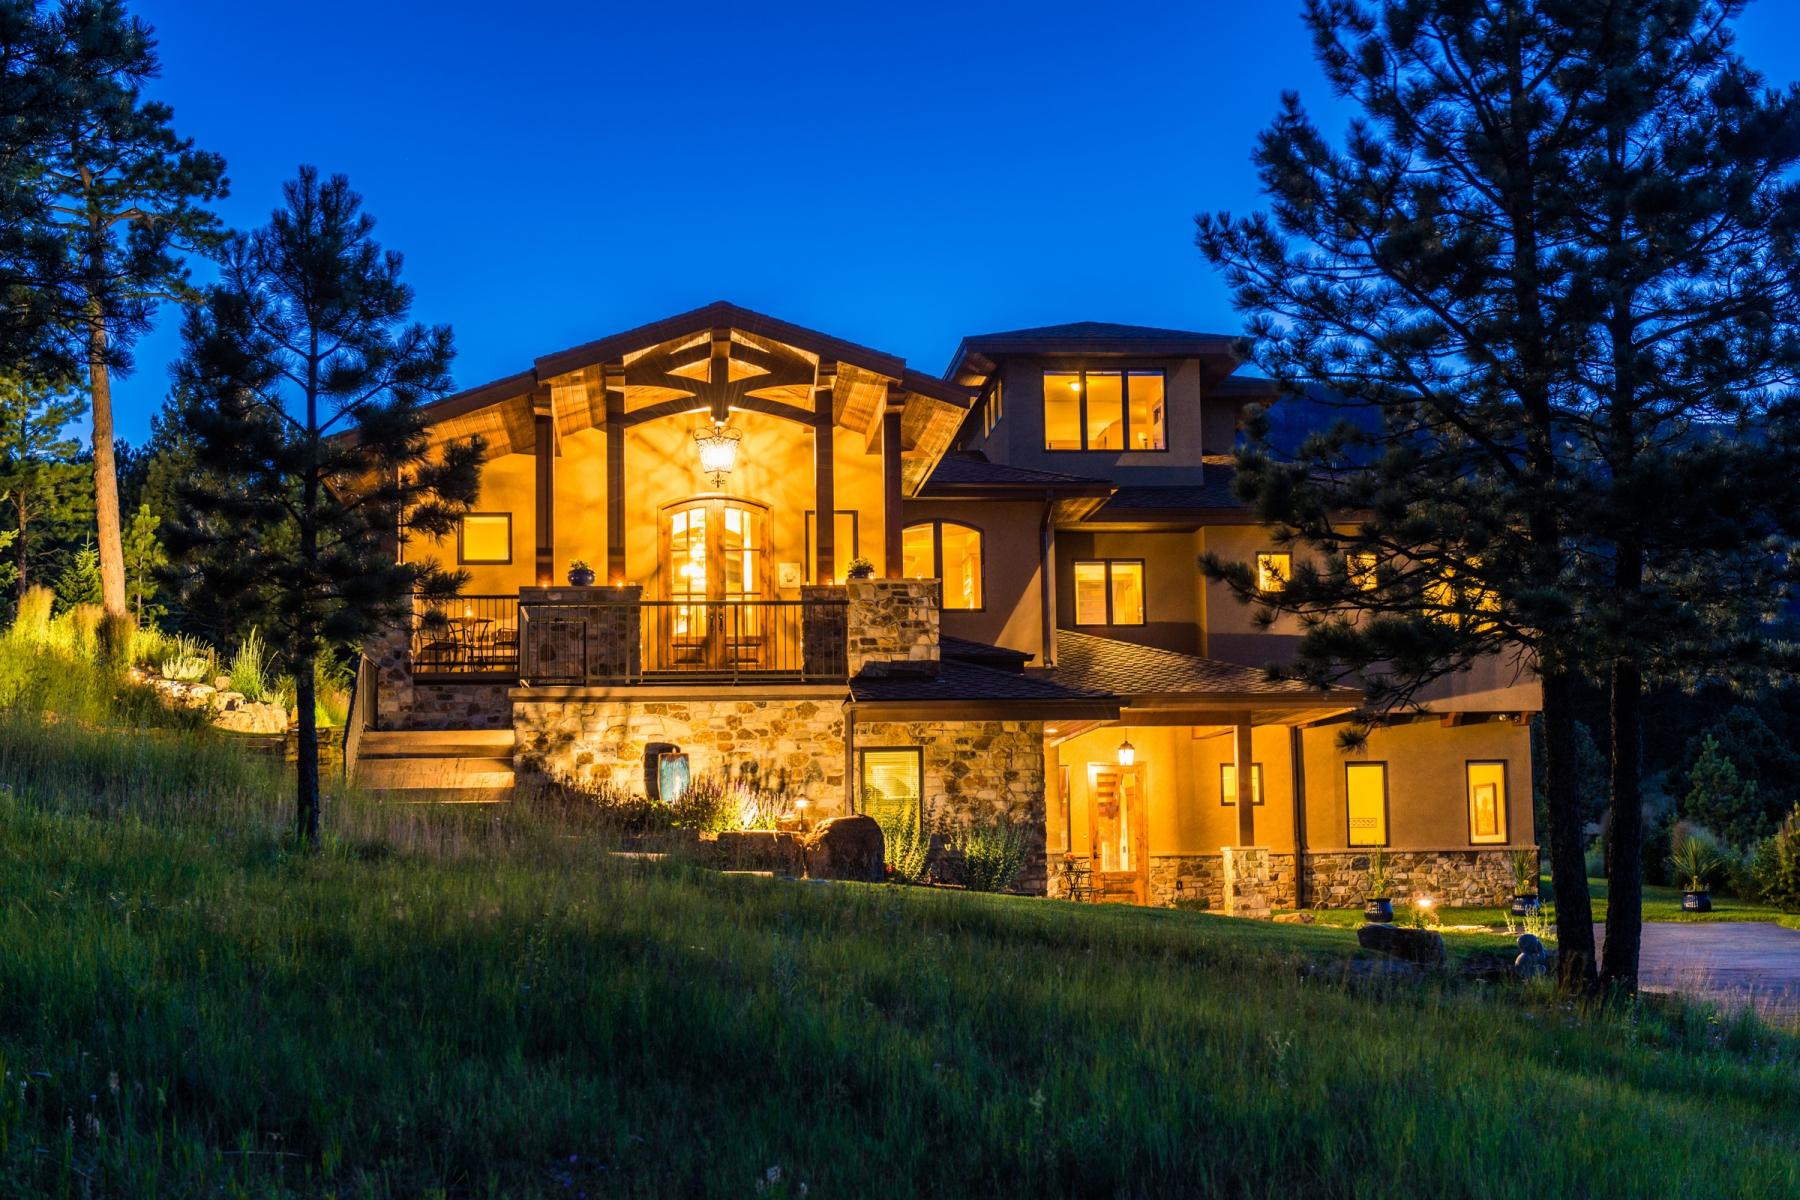 独户住宅 为 销售 在 Grand Tuscan Style Villa 3079 Royale Elk Way Evergreen, 科罗拉多州 80439 美国